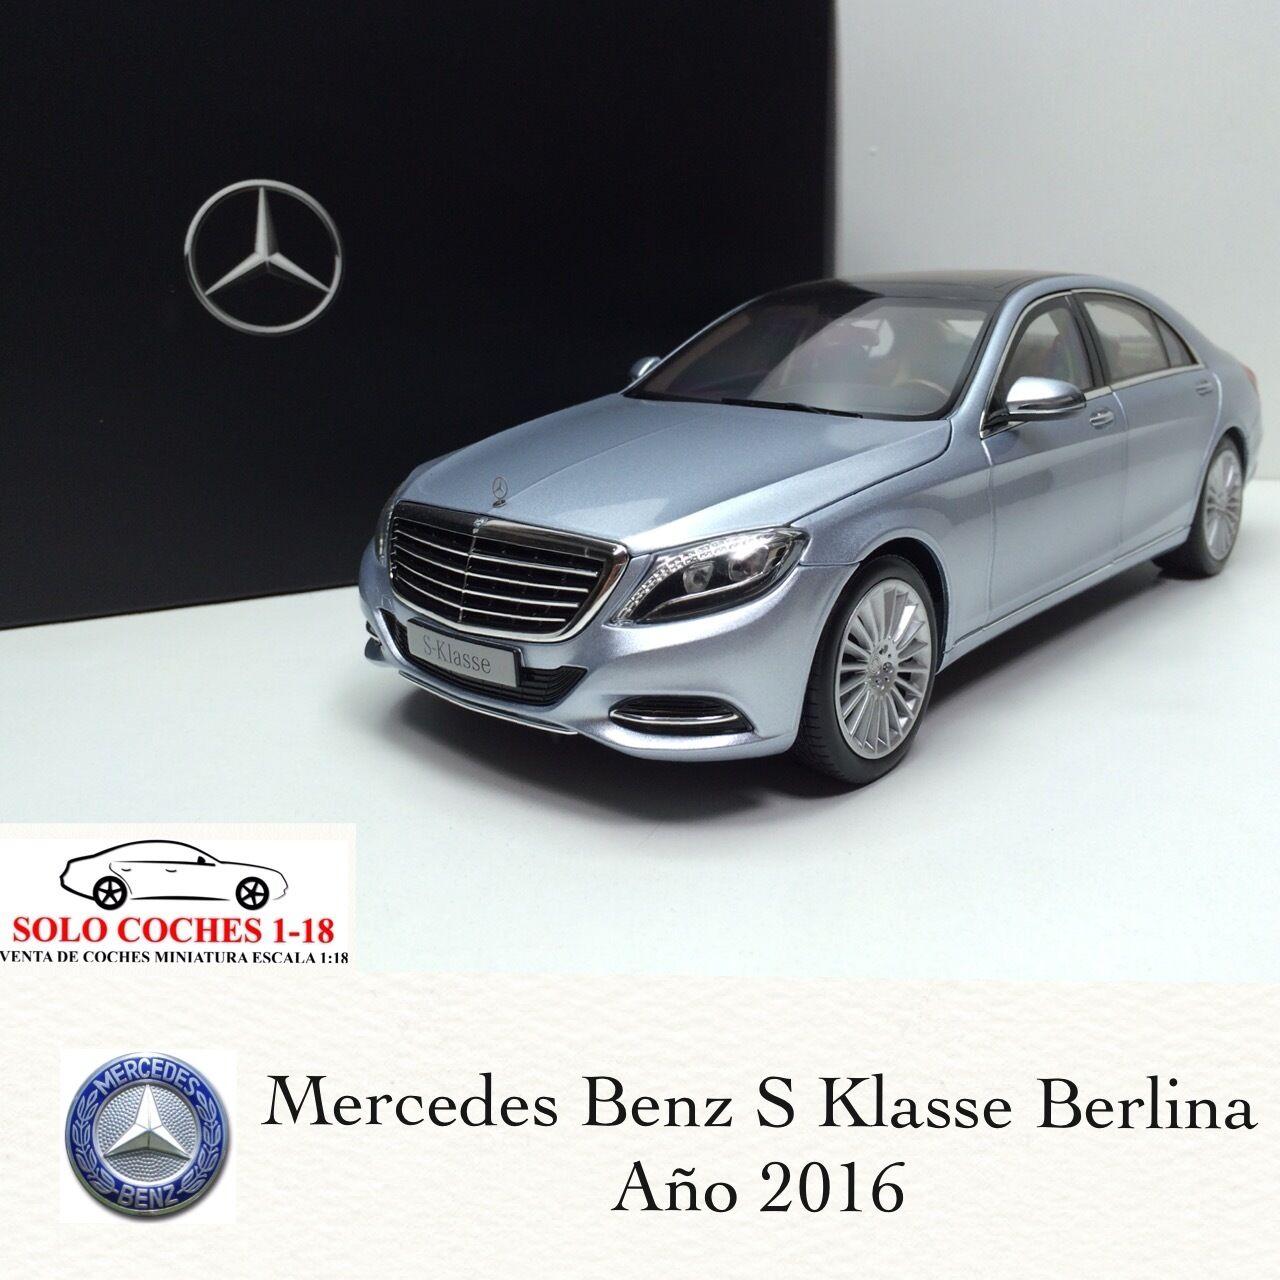 1 18 Mercedes Benz S KLasse Berlina V222 año 2016 Couleur argent Diamante Norev